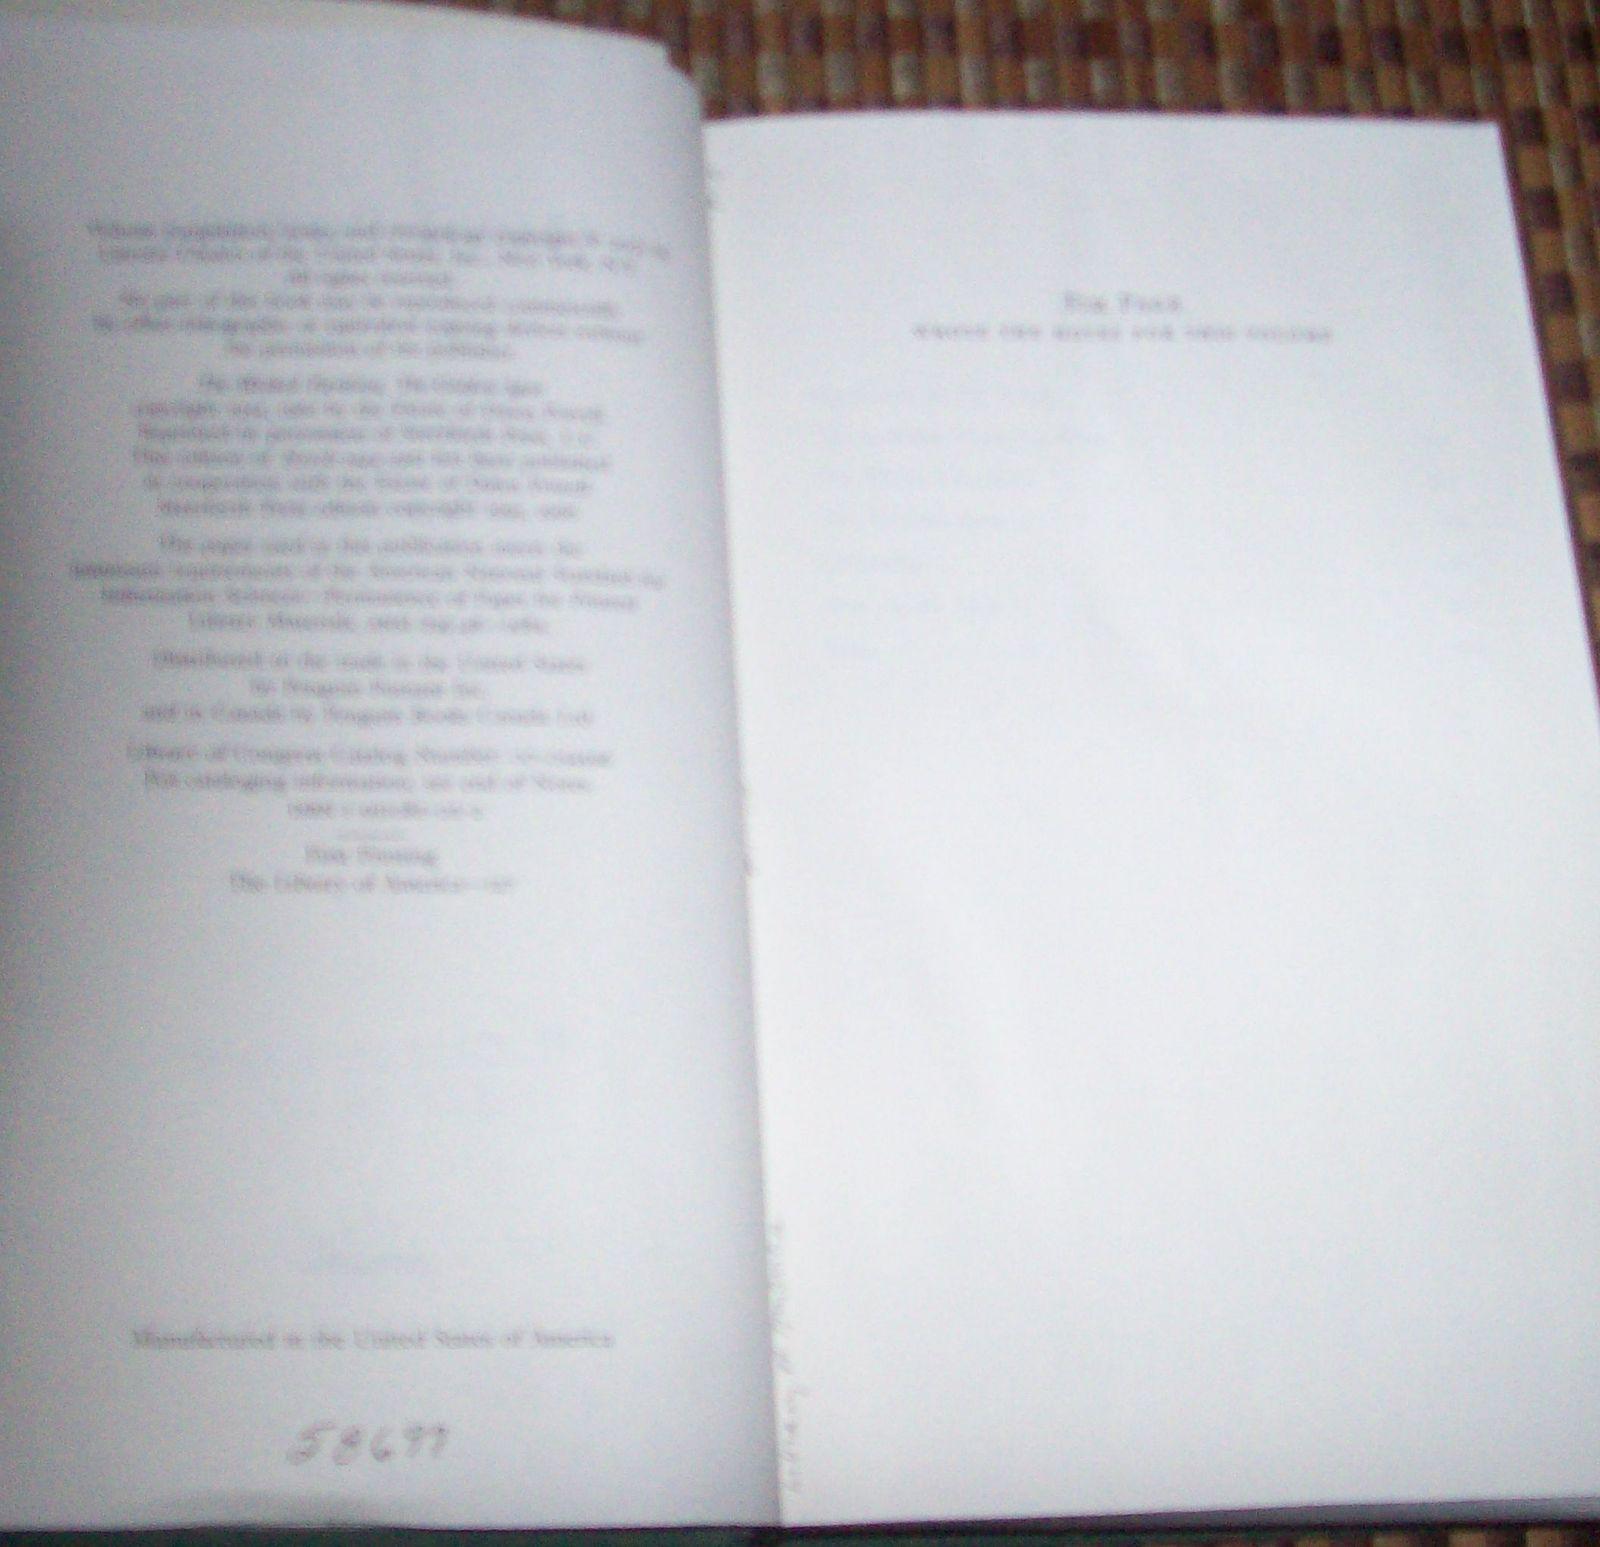 Dawn Powell Novels 1944-1962 Library of America 2001 HB